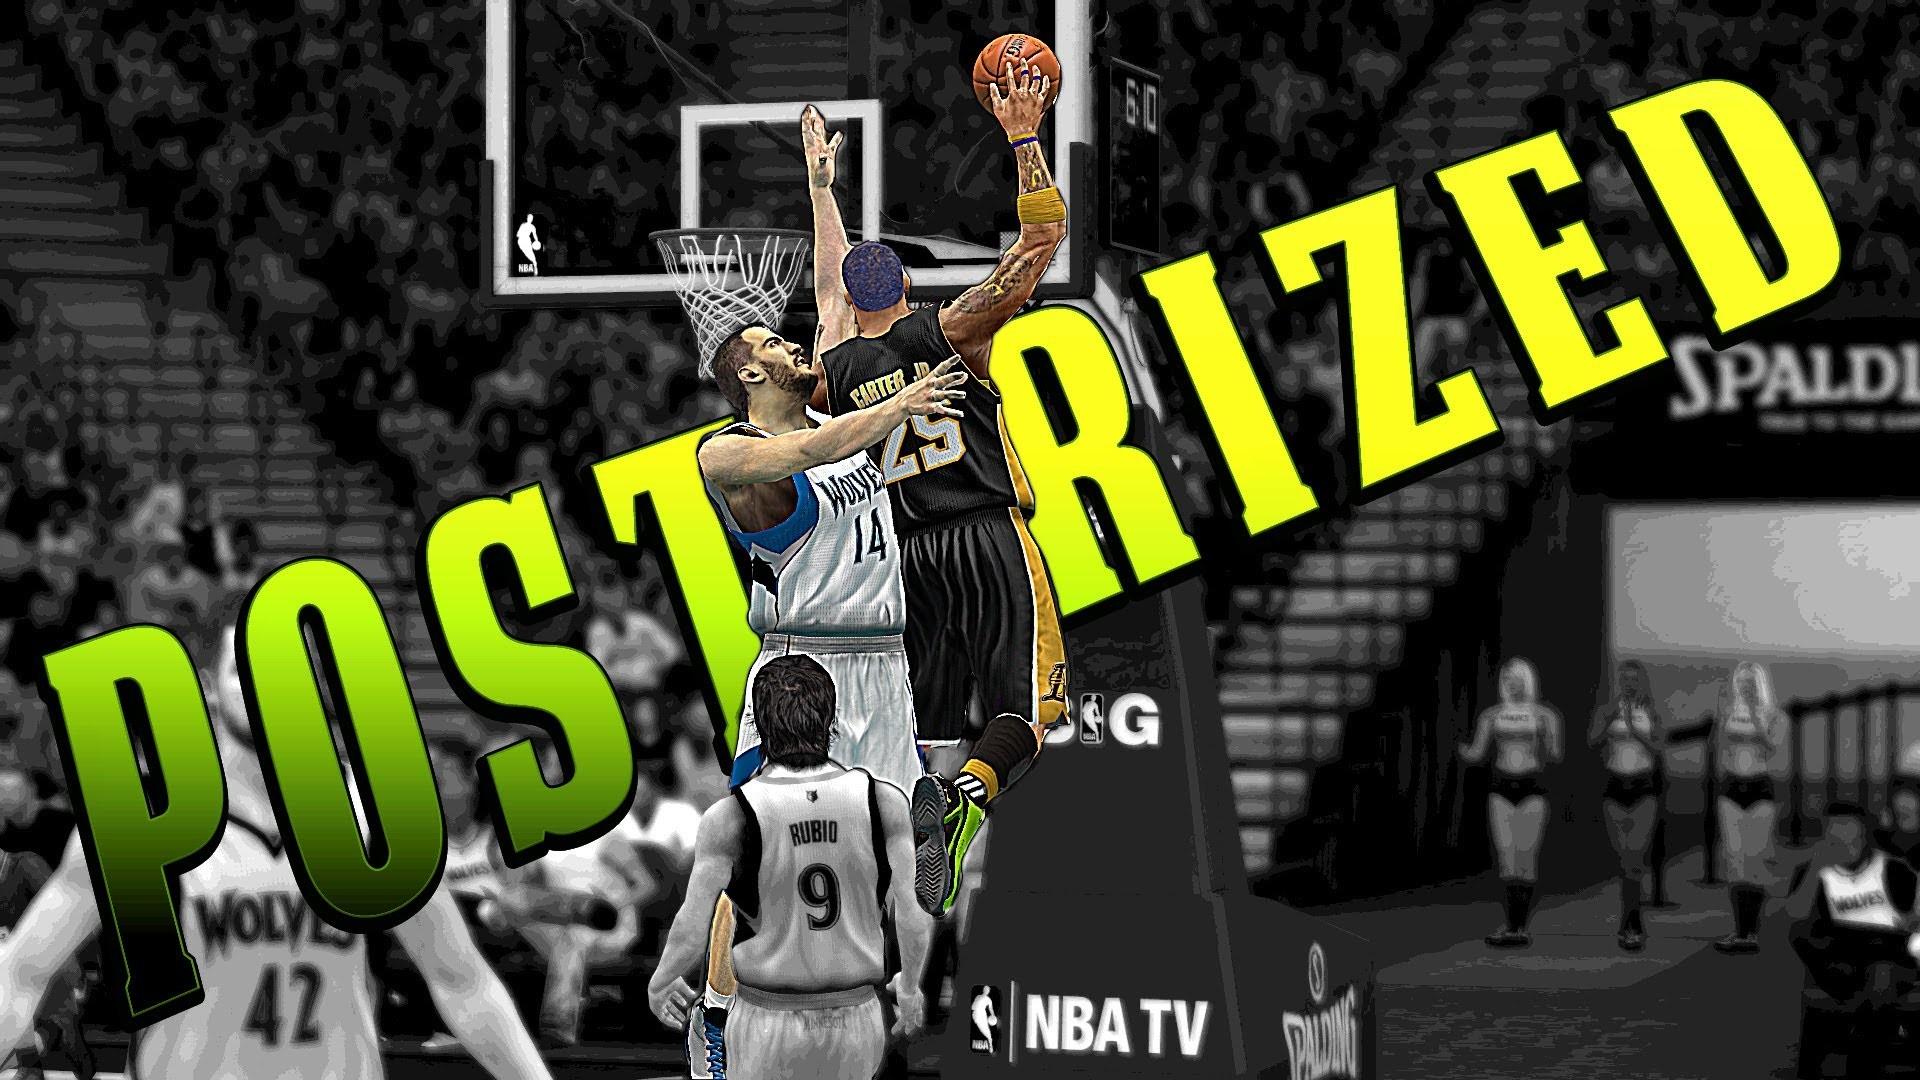 stephen curry wallpaper ndash – photo #31. NBA 2K13 MyCareer – 2 Game Recap    VC Jr. Up Against .